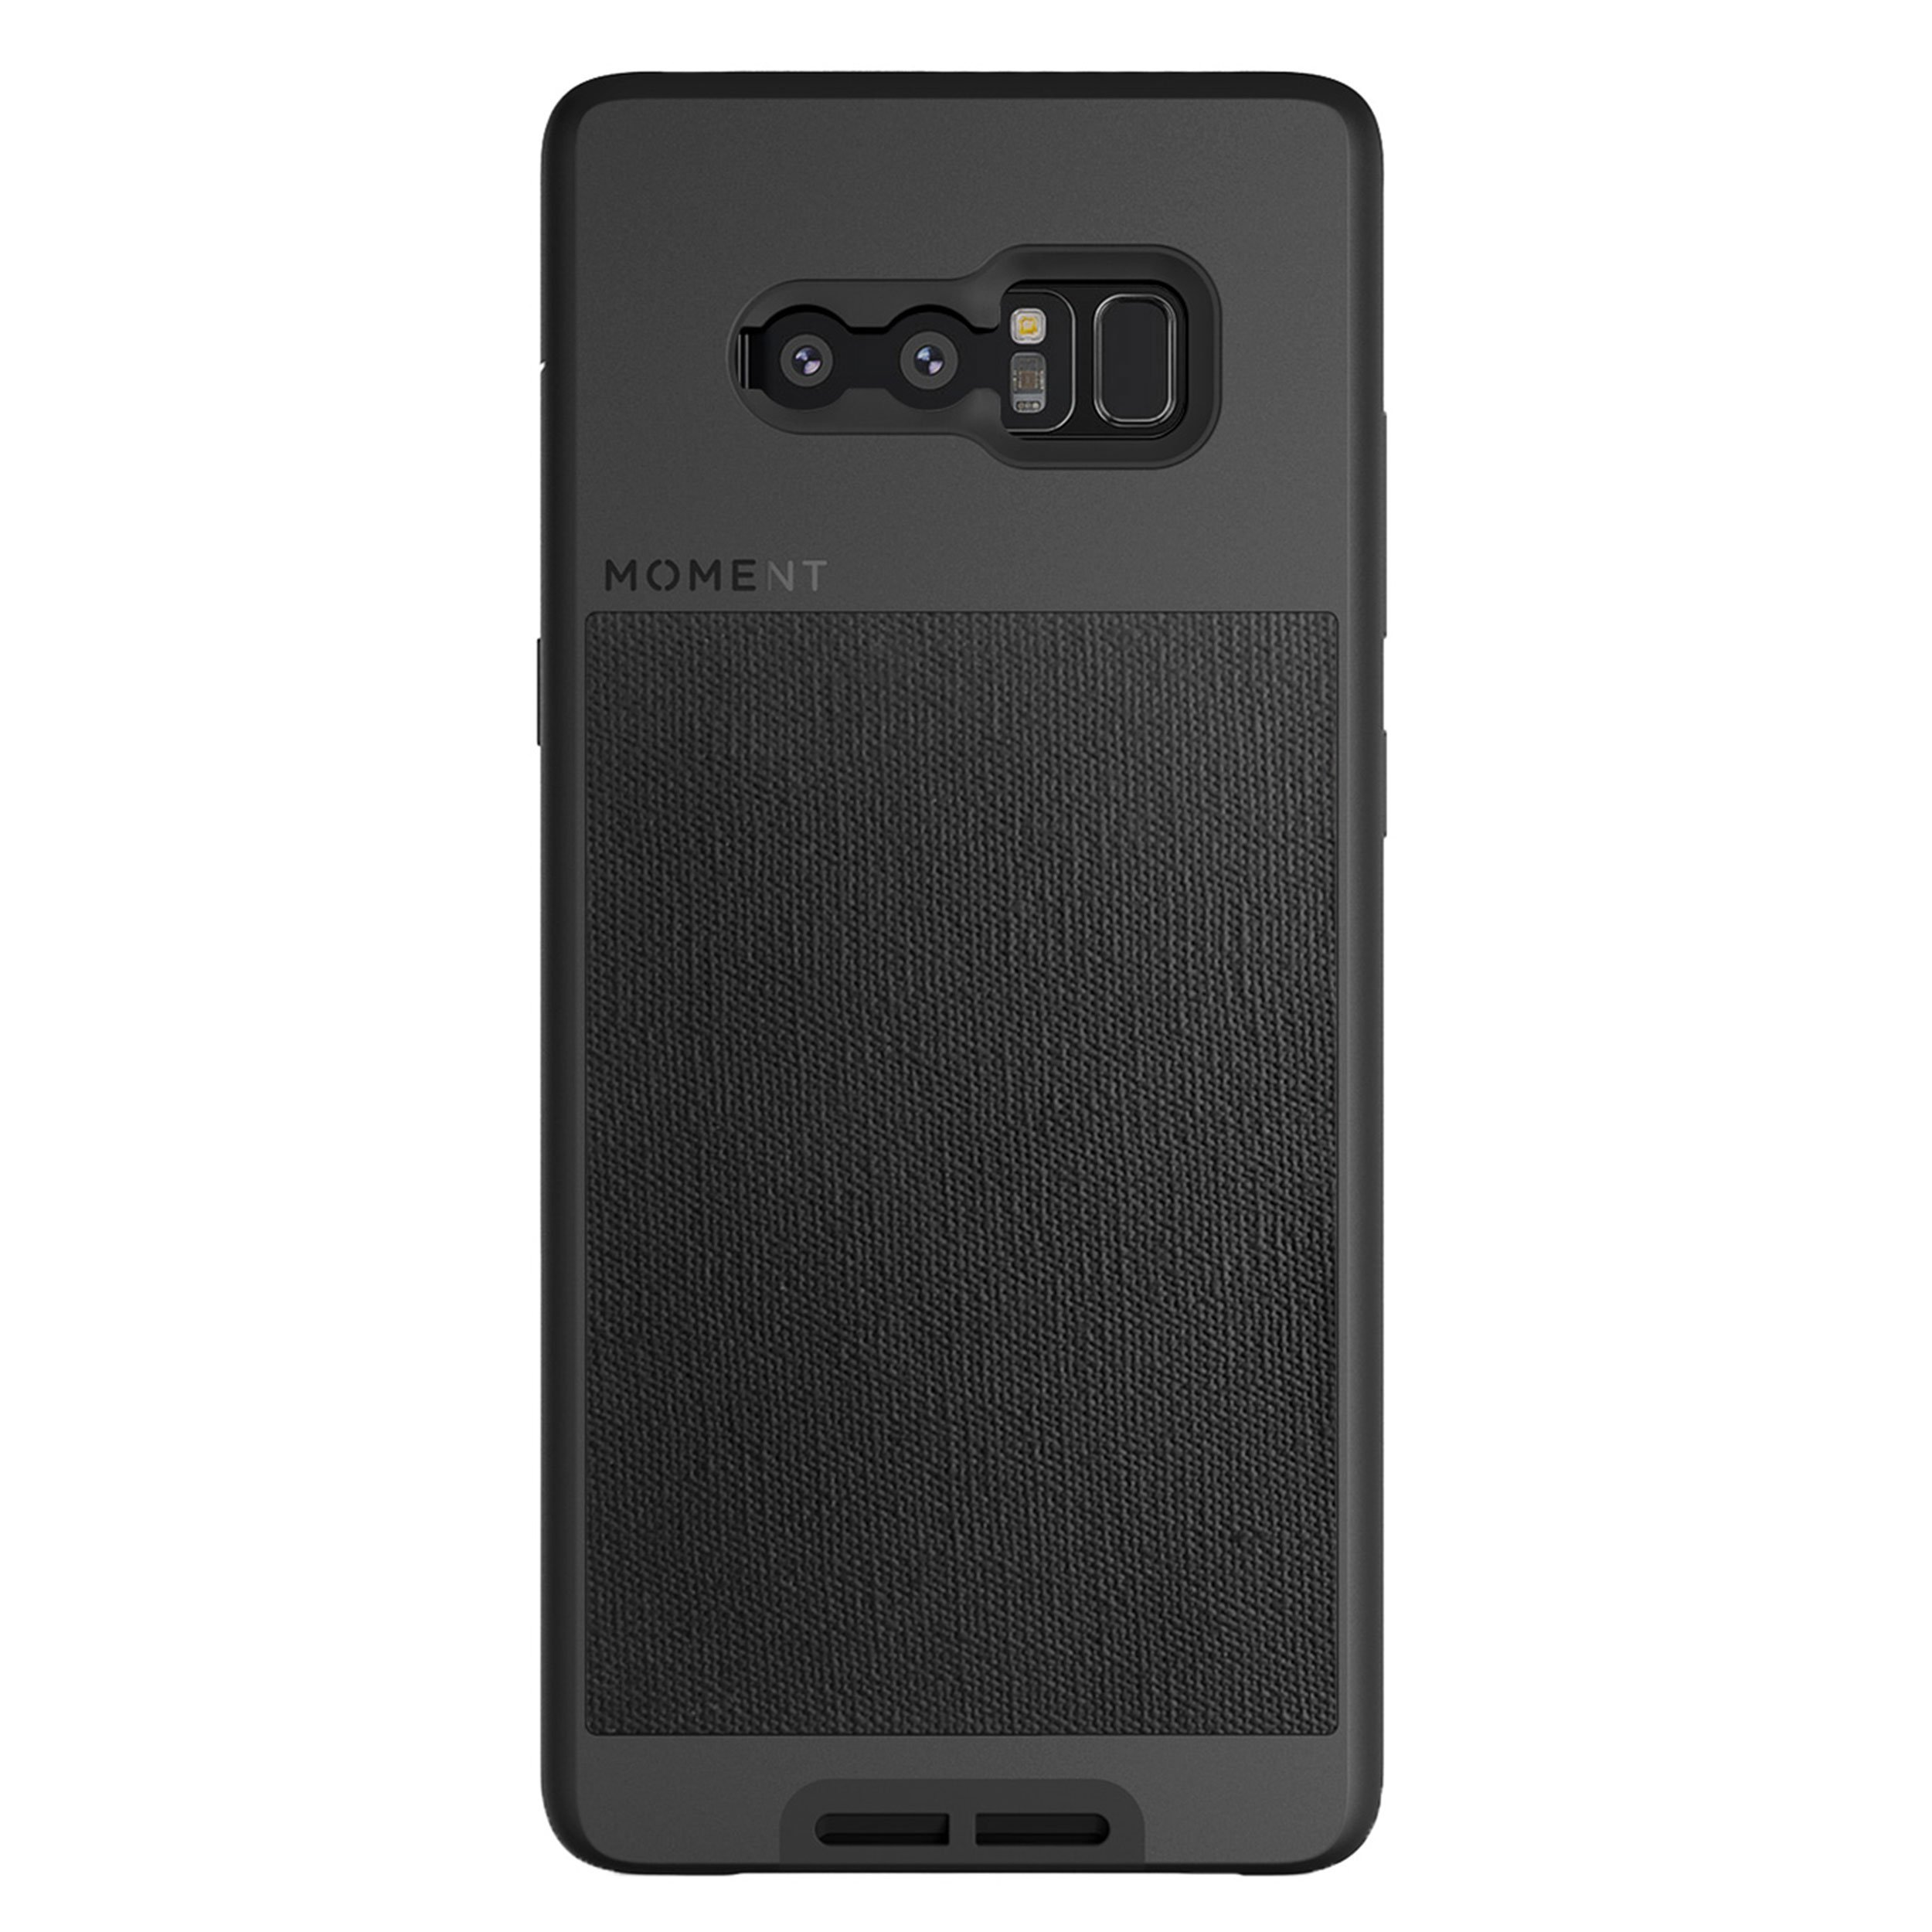 ویکالا · خرید  اصل اورجینال · خرید از آمازون · Galaxy Note 8 Case || Moment Photo Case in Black Canvas - Thin, Protective, Wrist Strap Friendly case for Camera Lovers. wekala · ویکالا